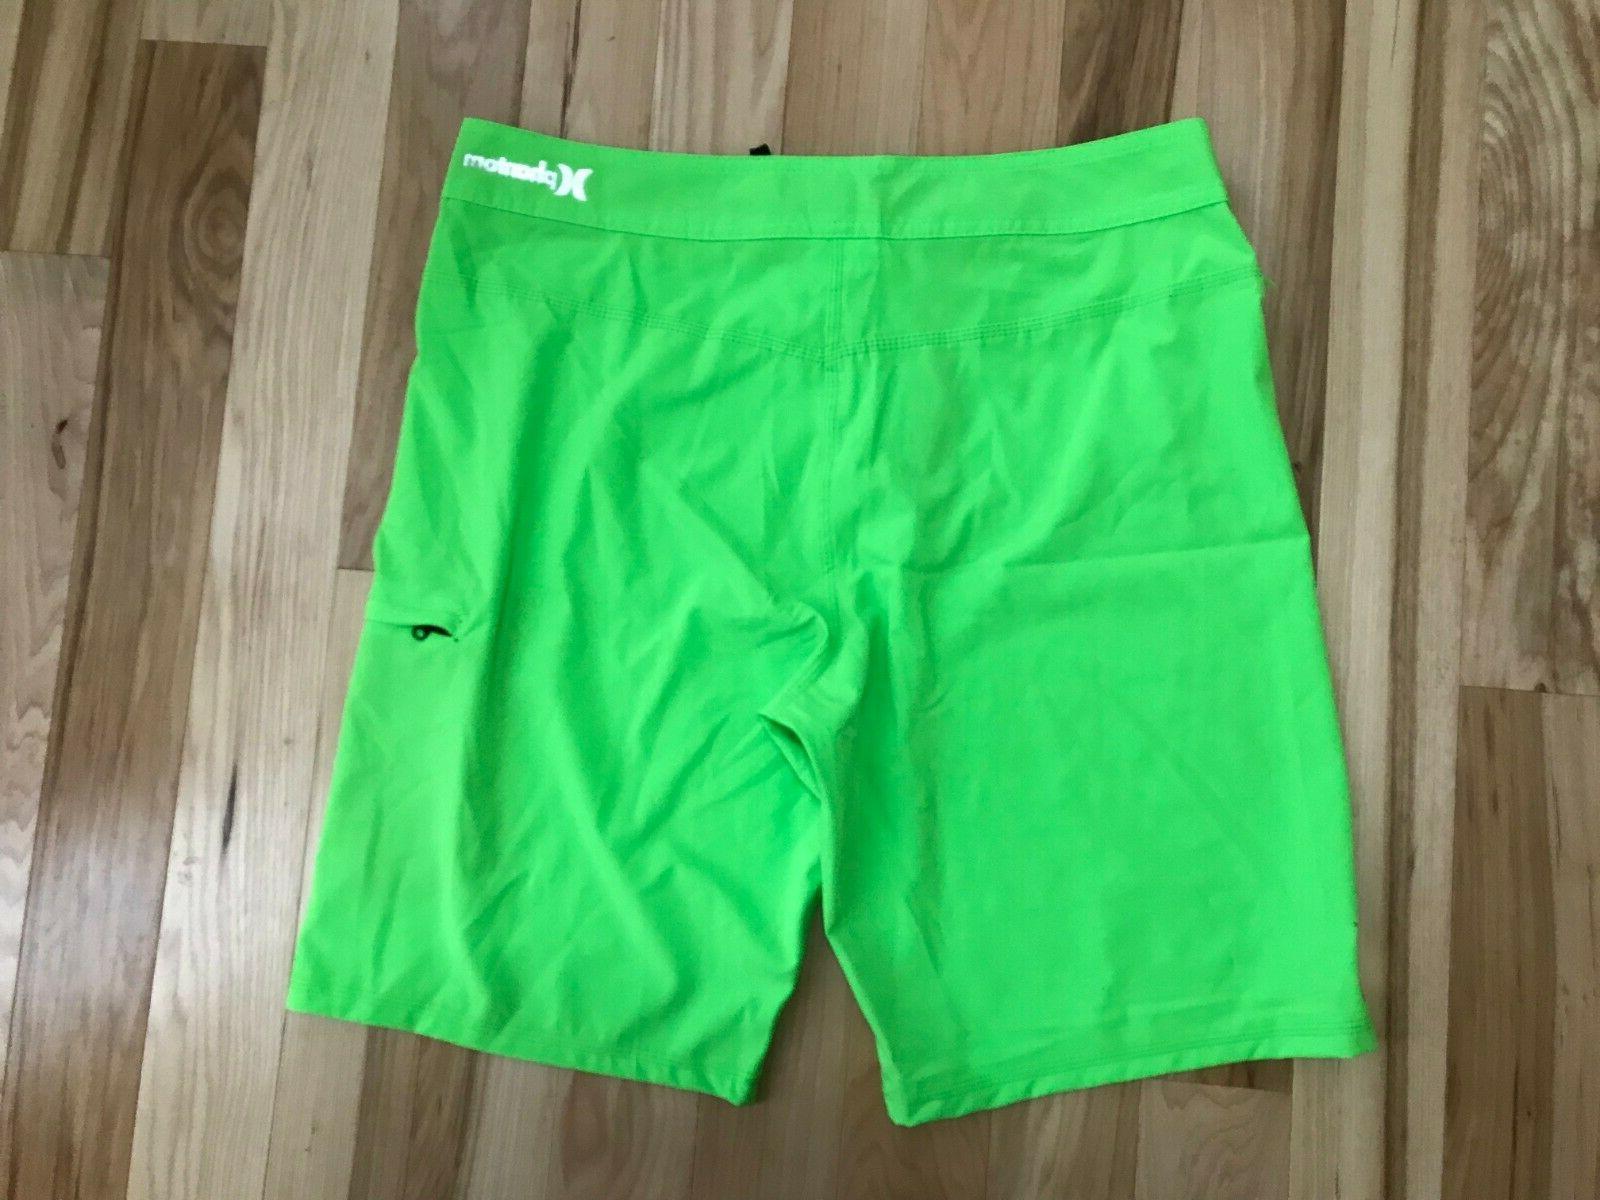 NWT HURLEY and Green Board Shorts Sz 33